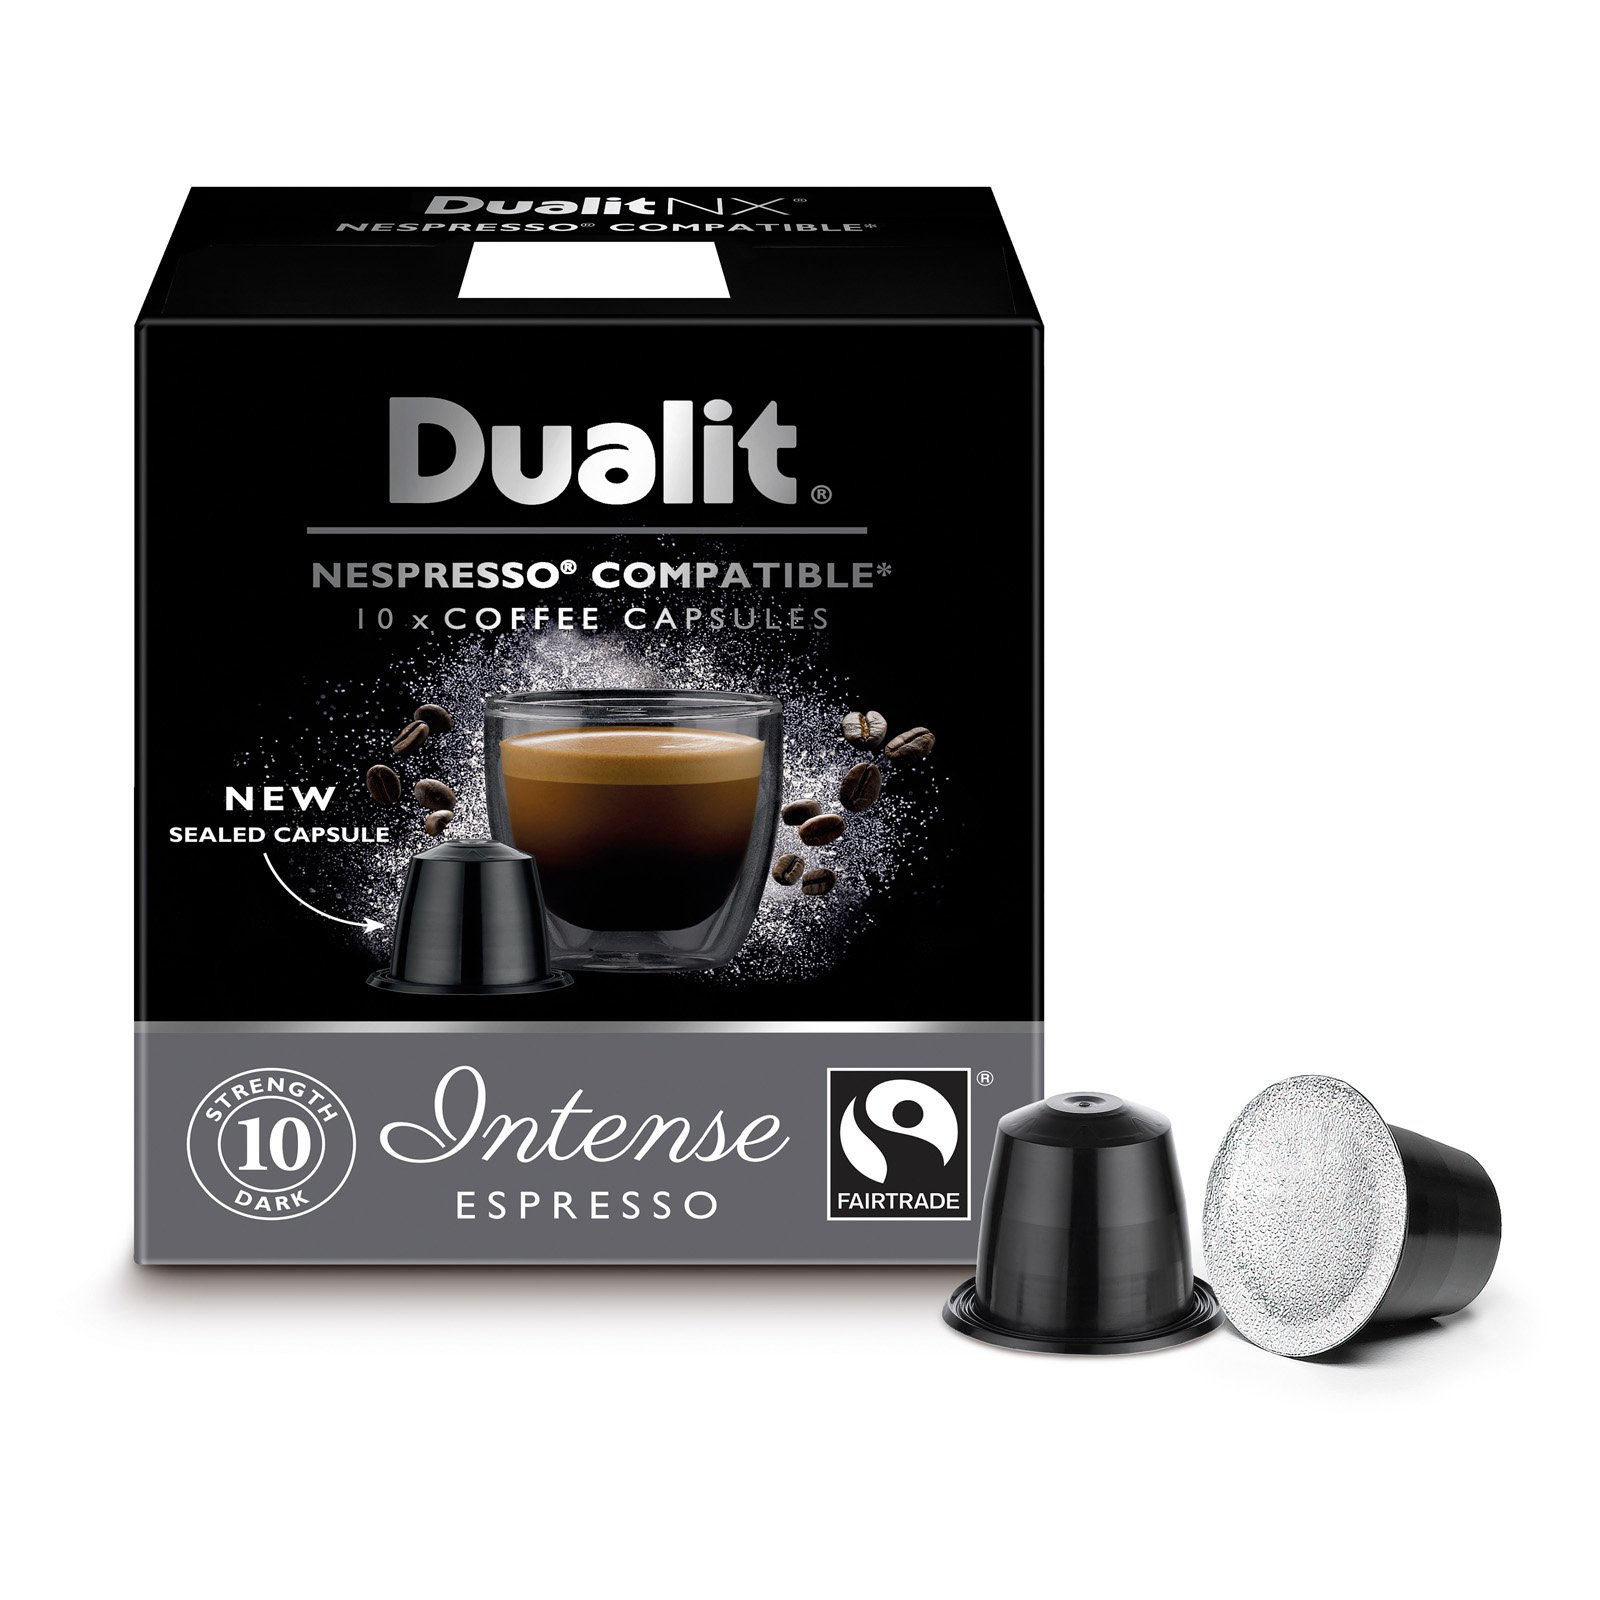 Dualit NX Intense Espresso 60 pack